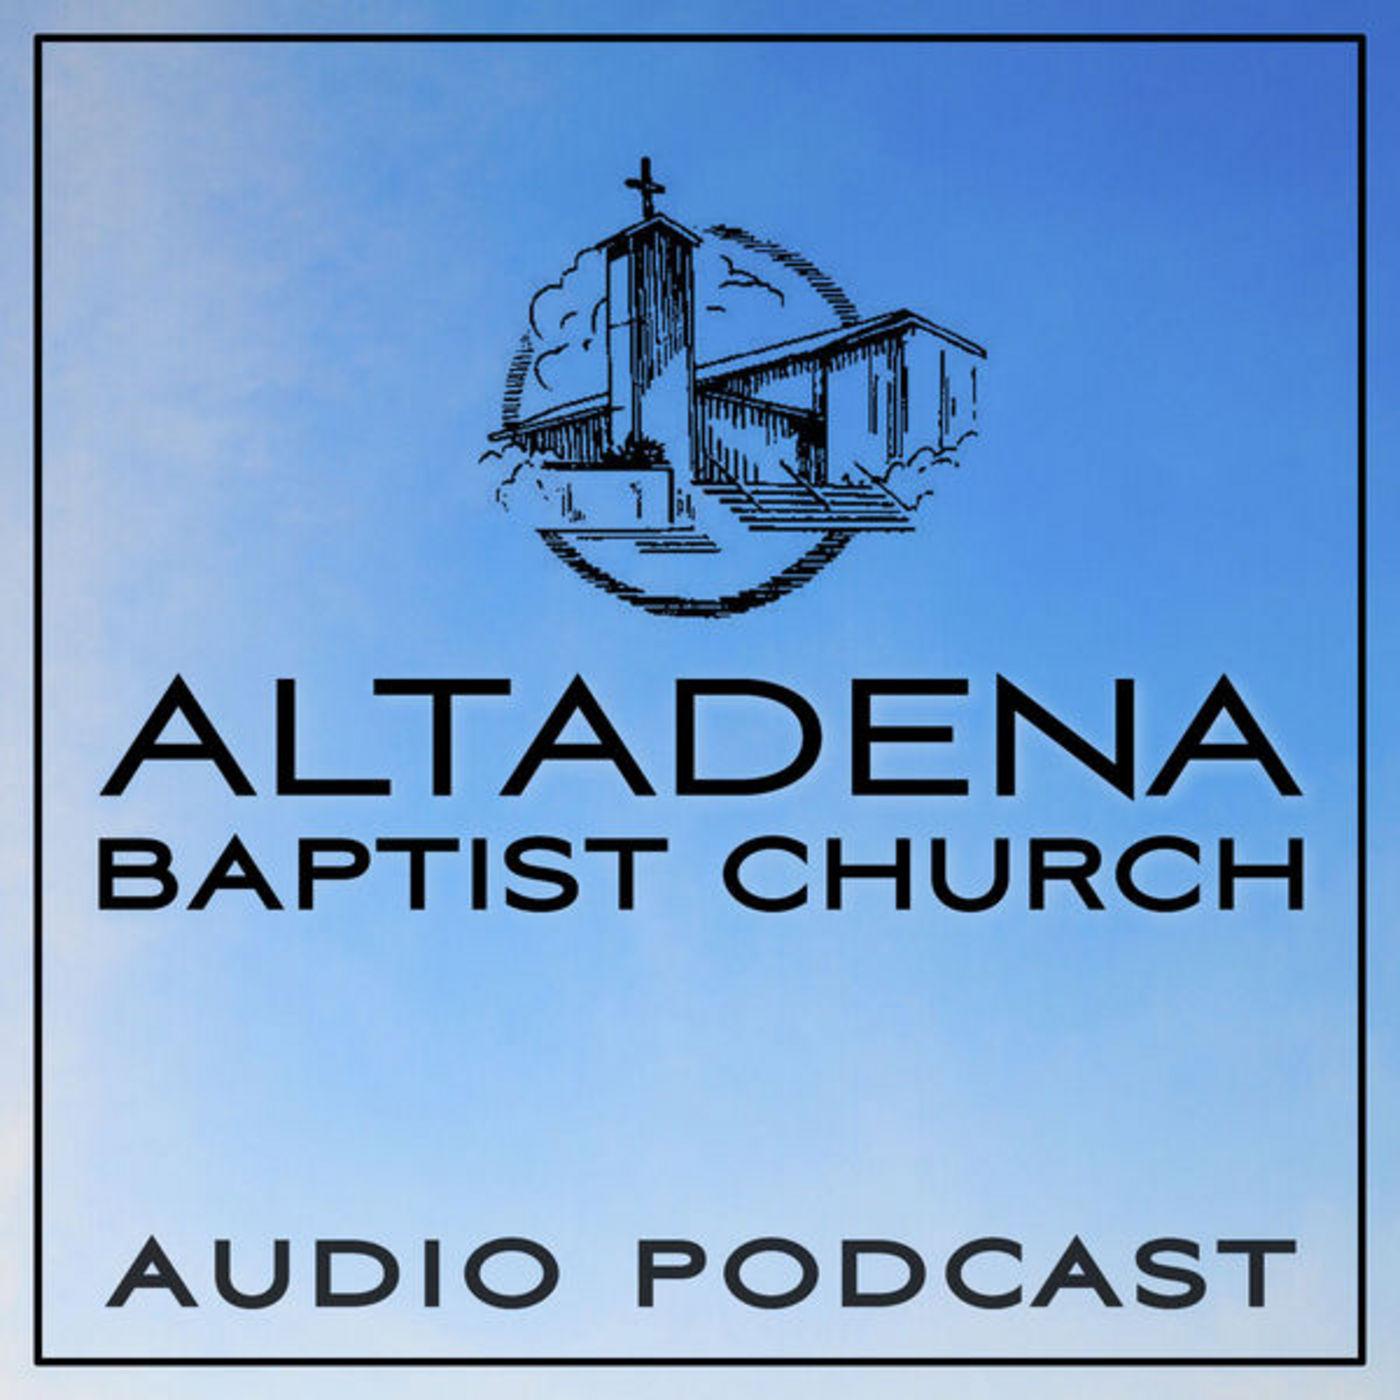 <![CDATA[Altadena Baptist Church]]>